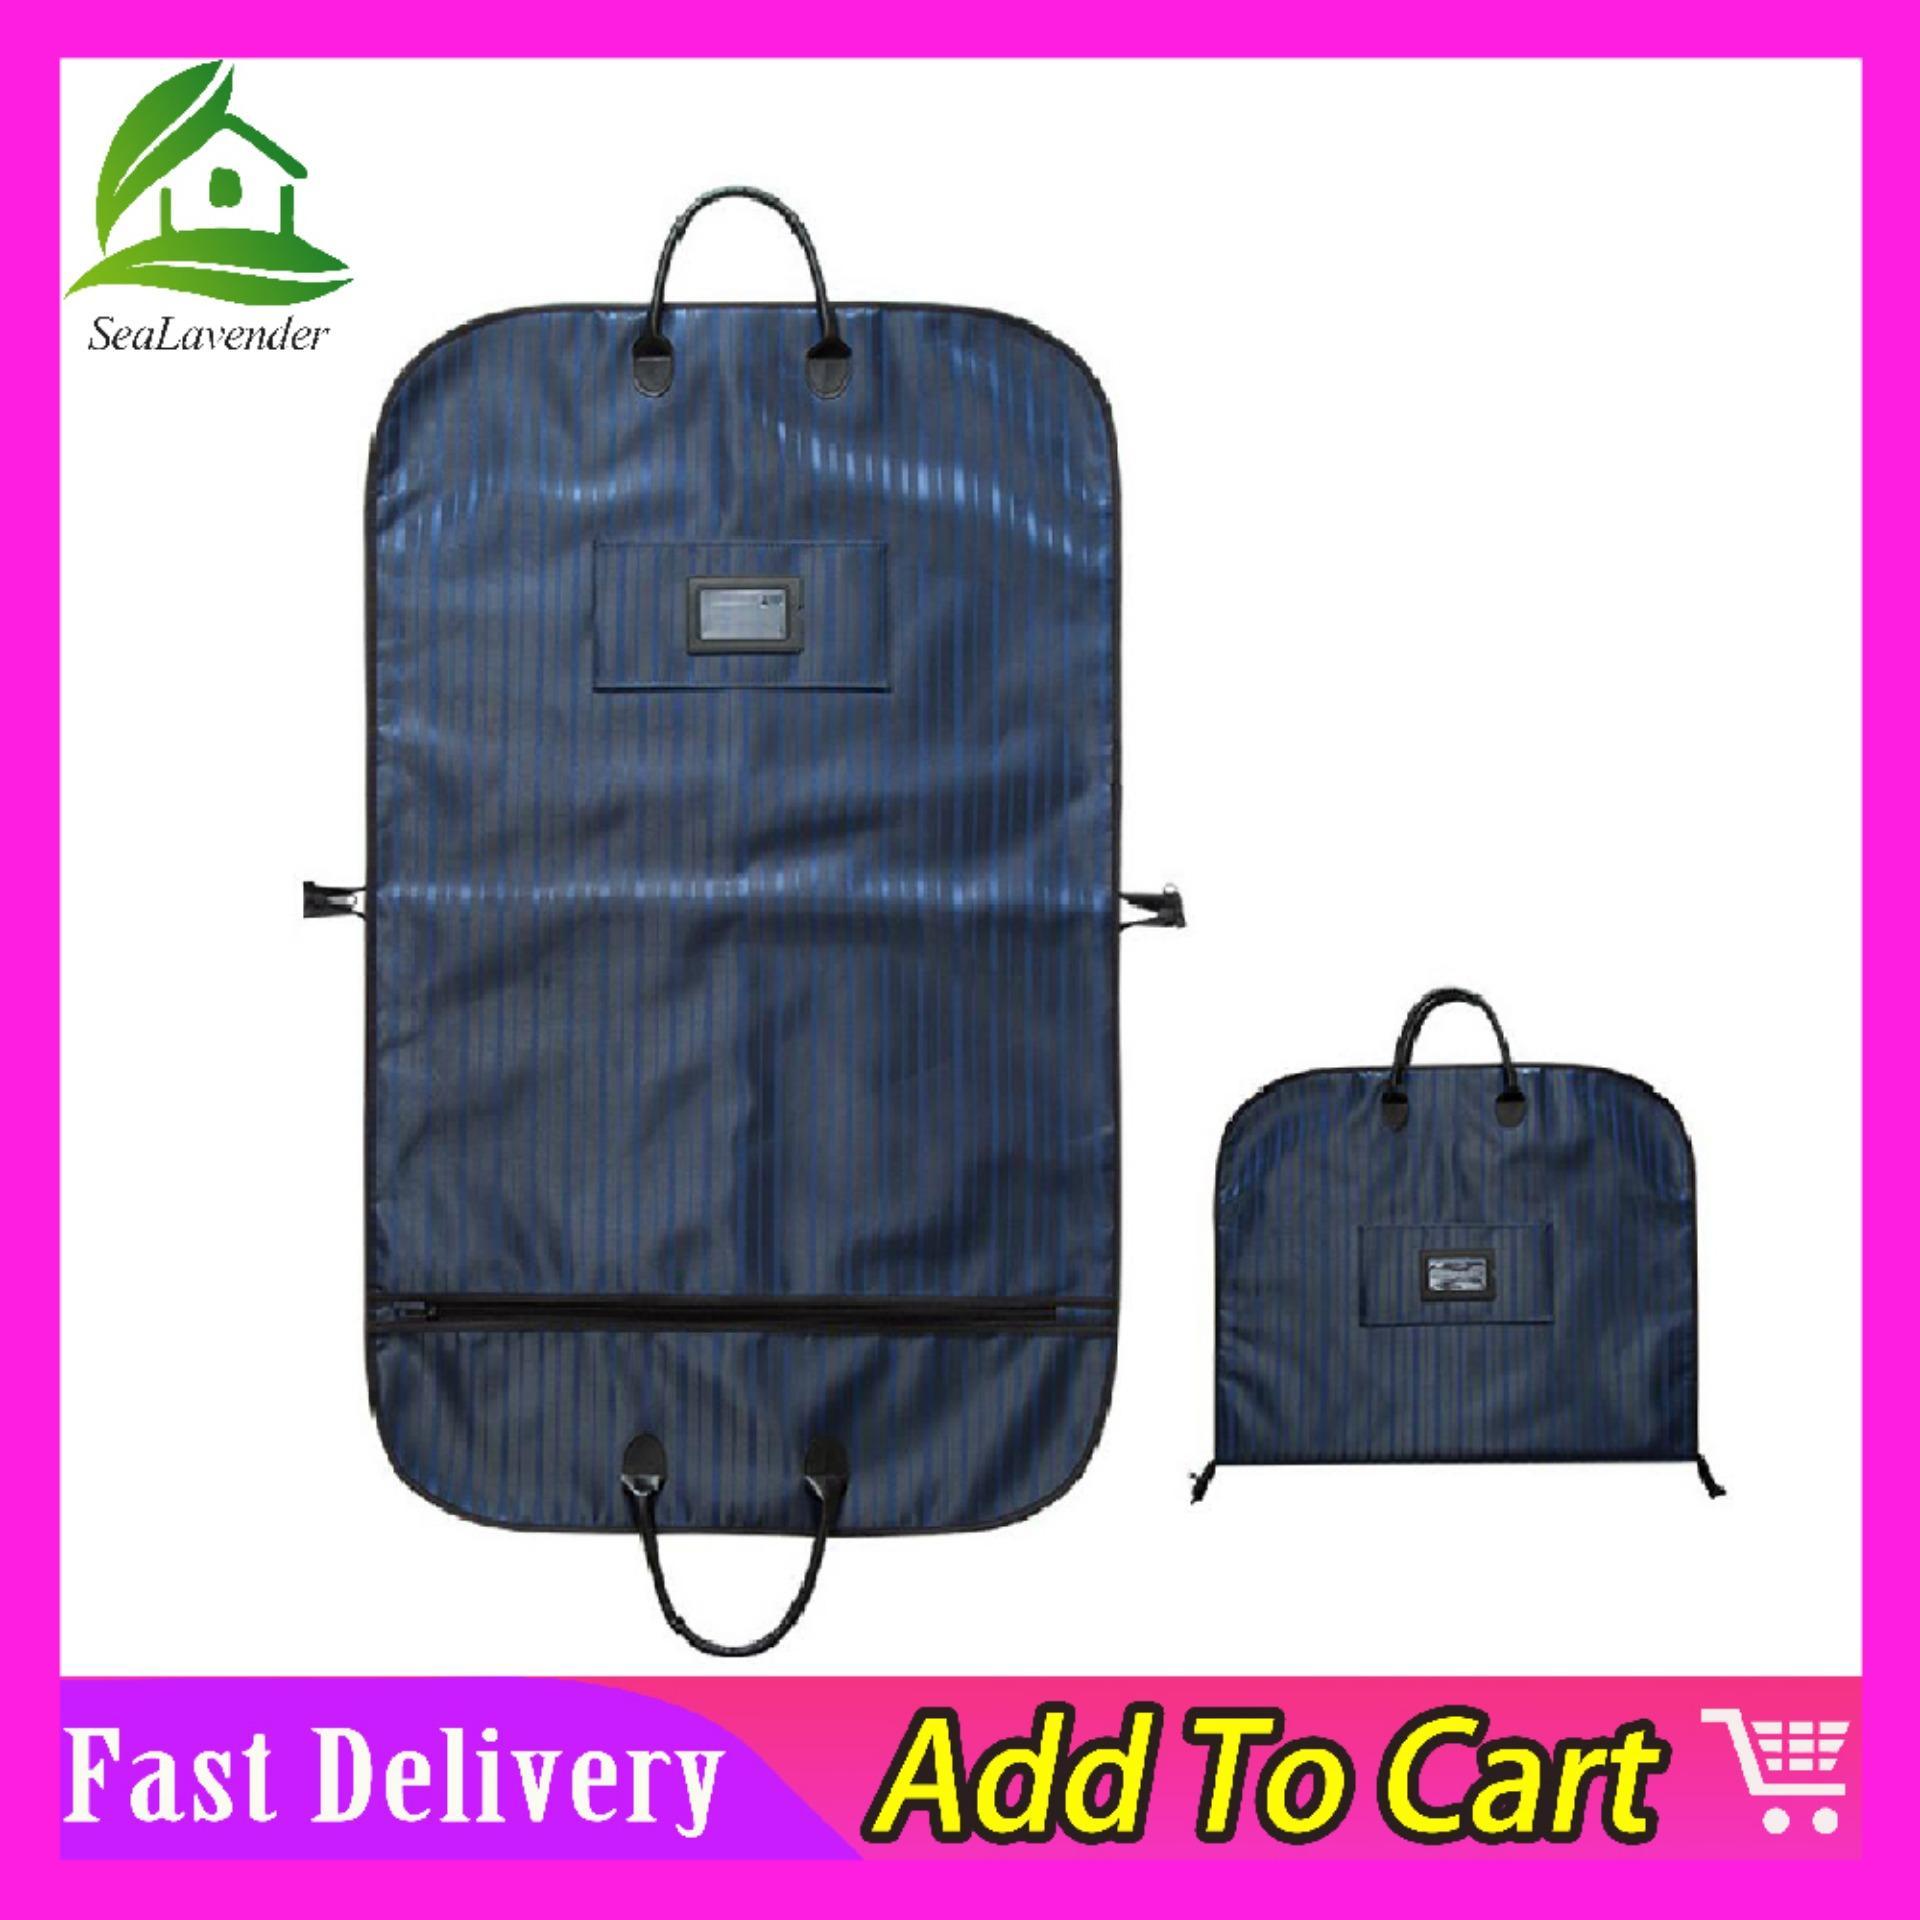 0d2e613e6f1bf SeaLavender Suit Storage Bag for Men,Oxford Cloth Air Tight Garment Bag  Fabric Breathable Travel